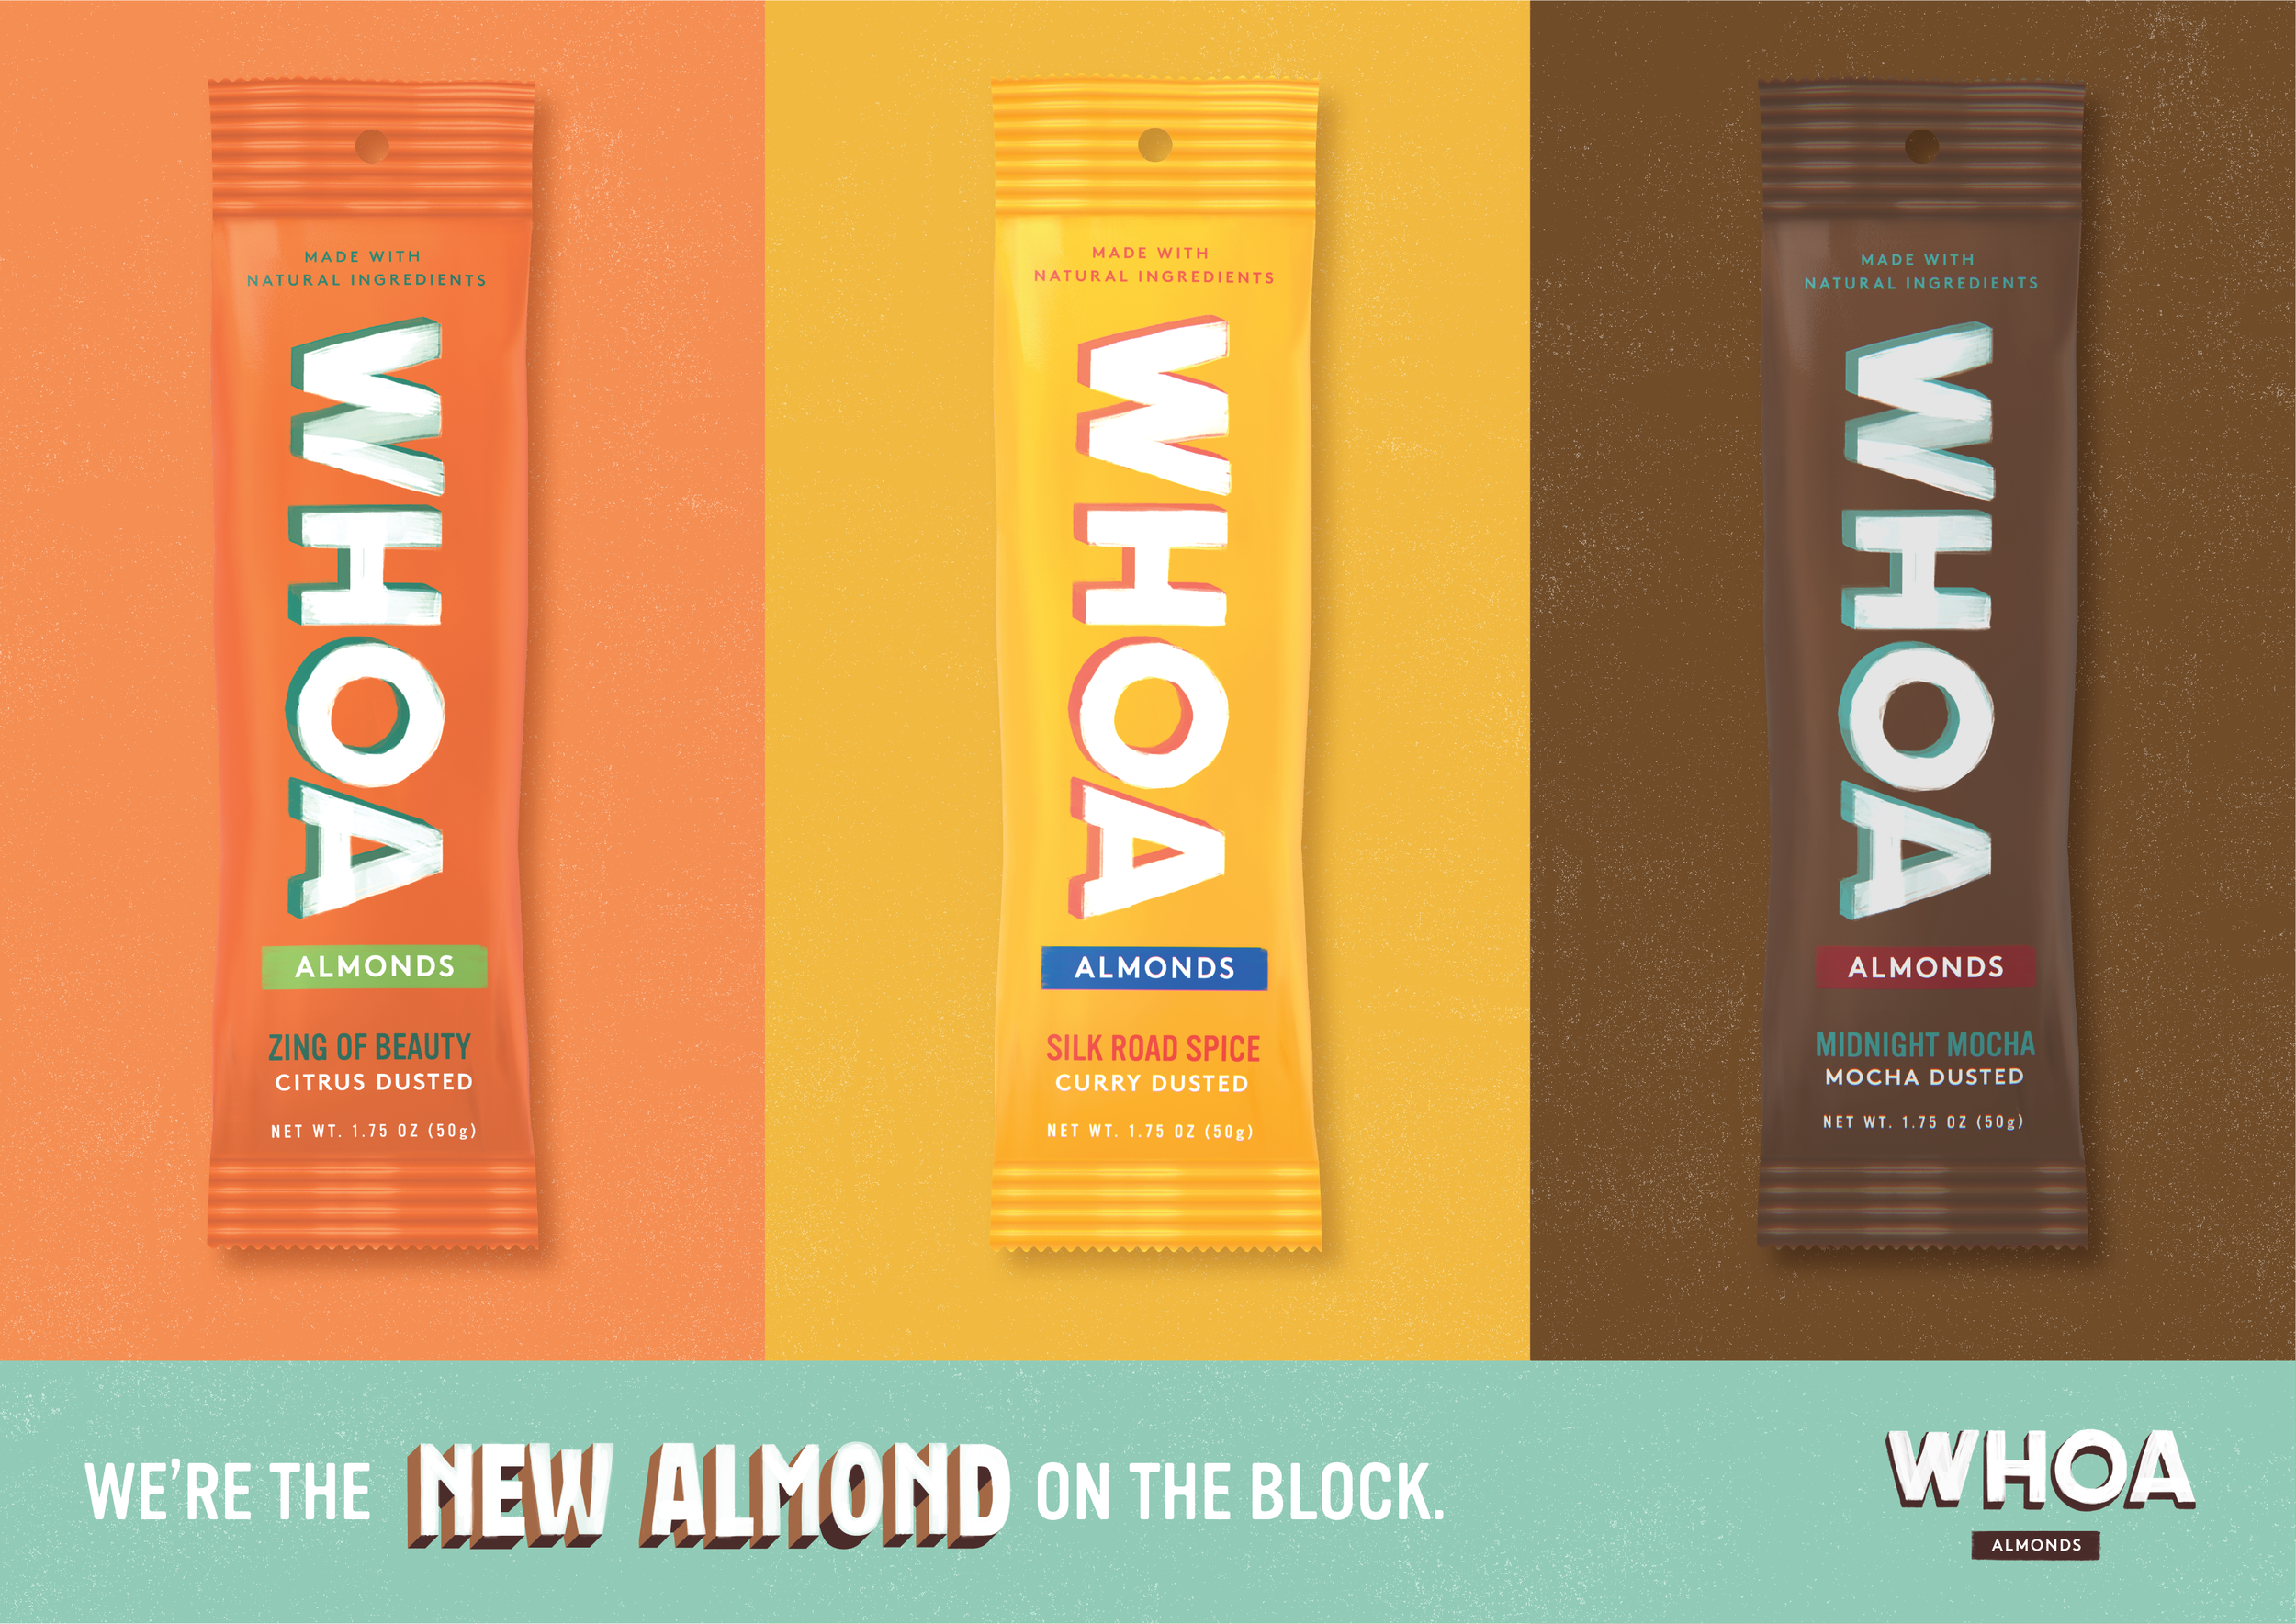 WHOA Almonds